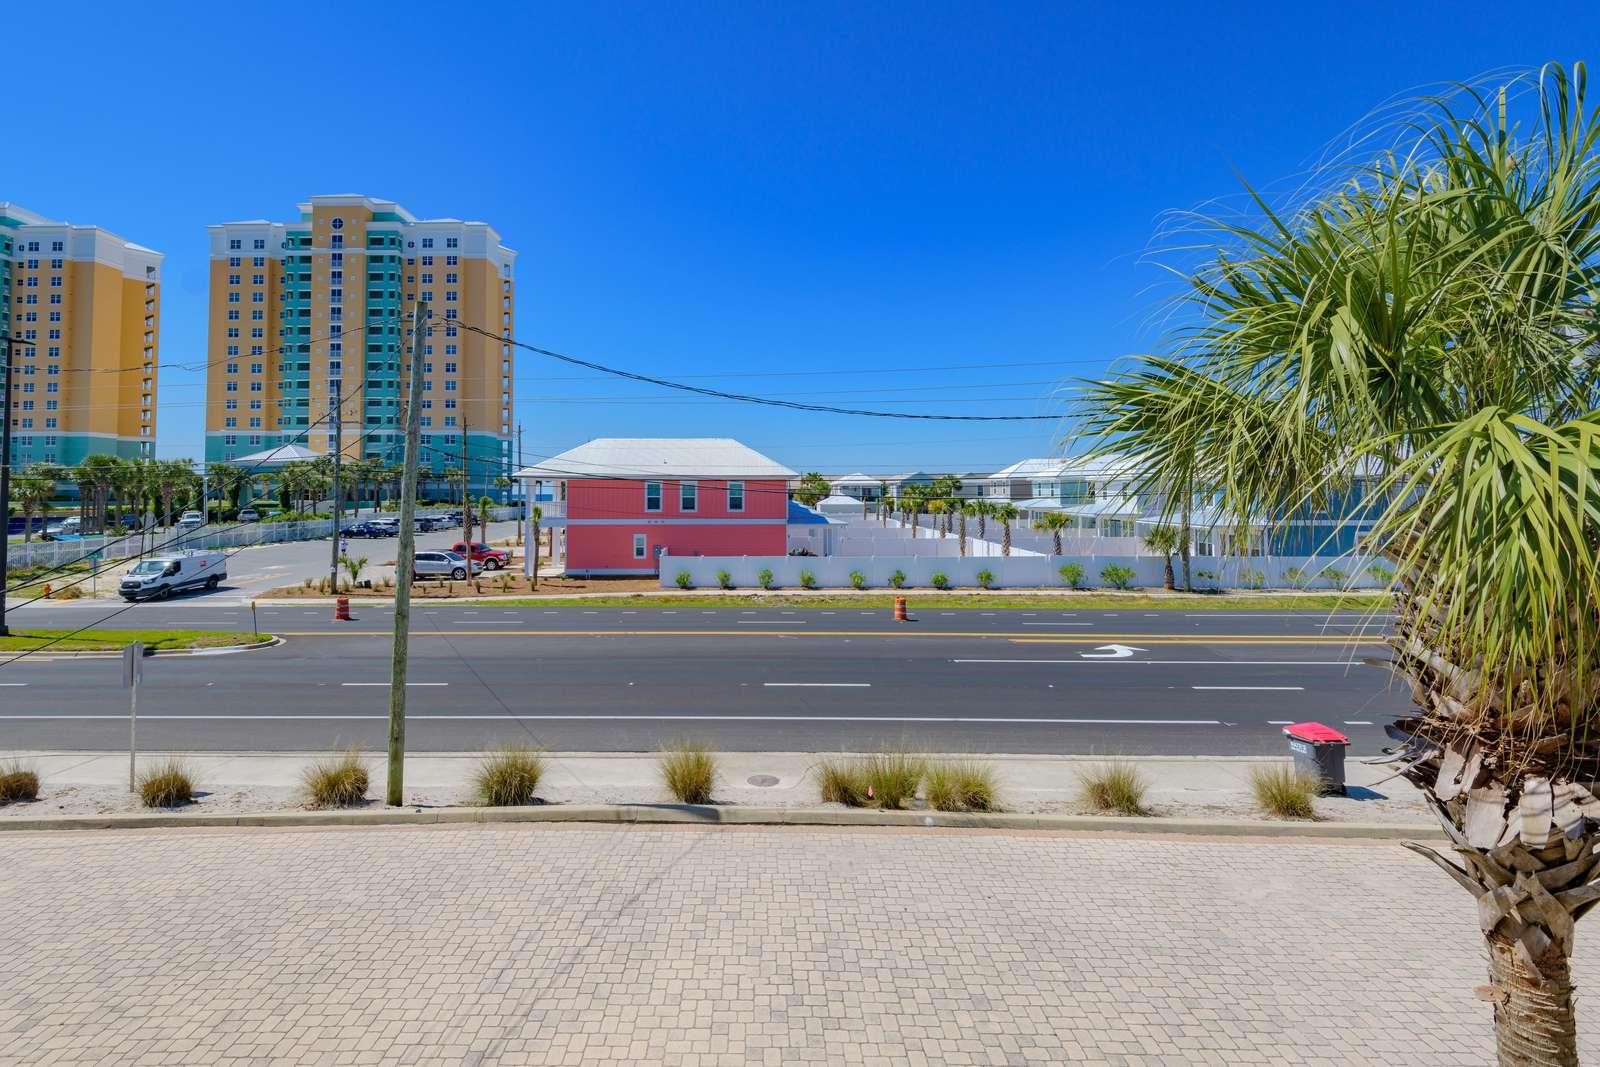 Just off Thomas Drive & Beach Access 16 across the street!